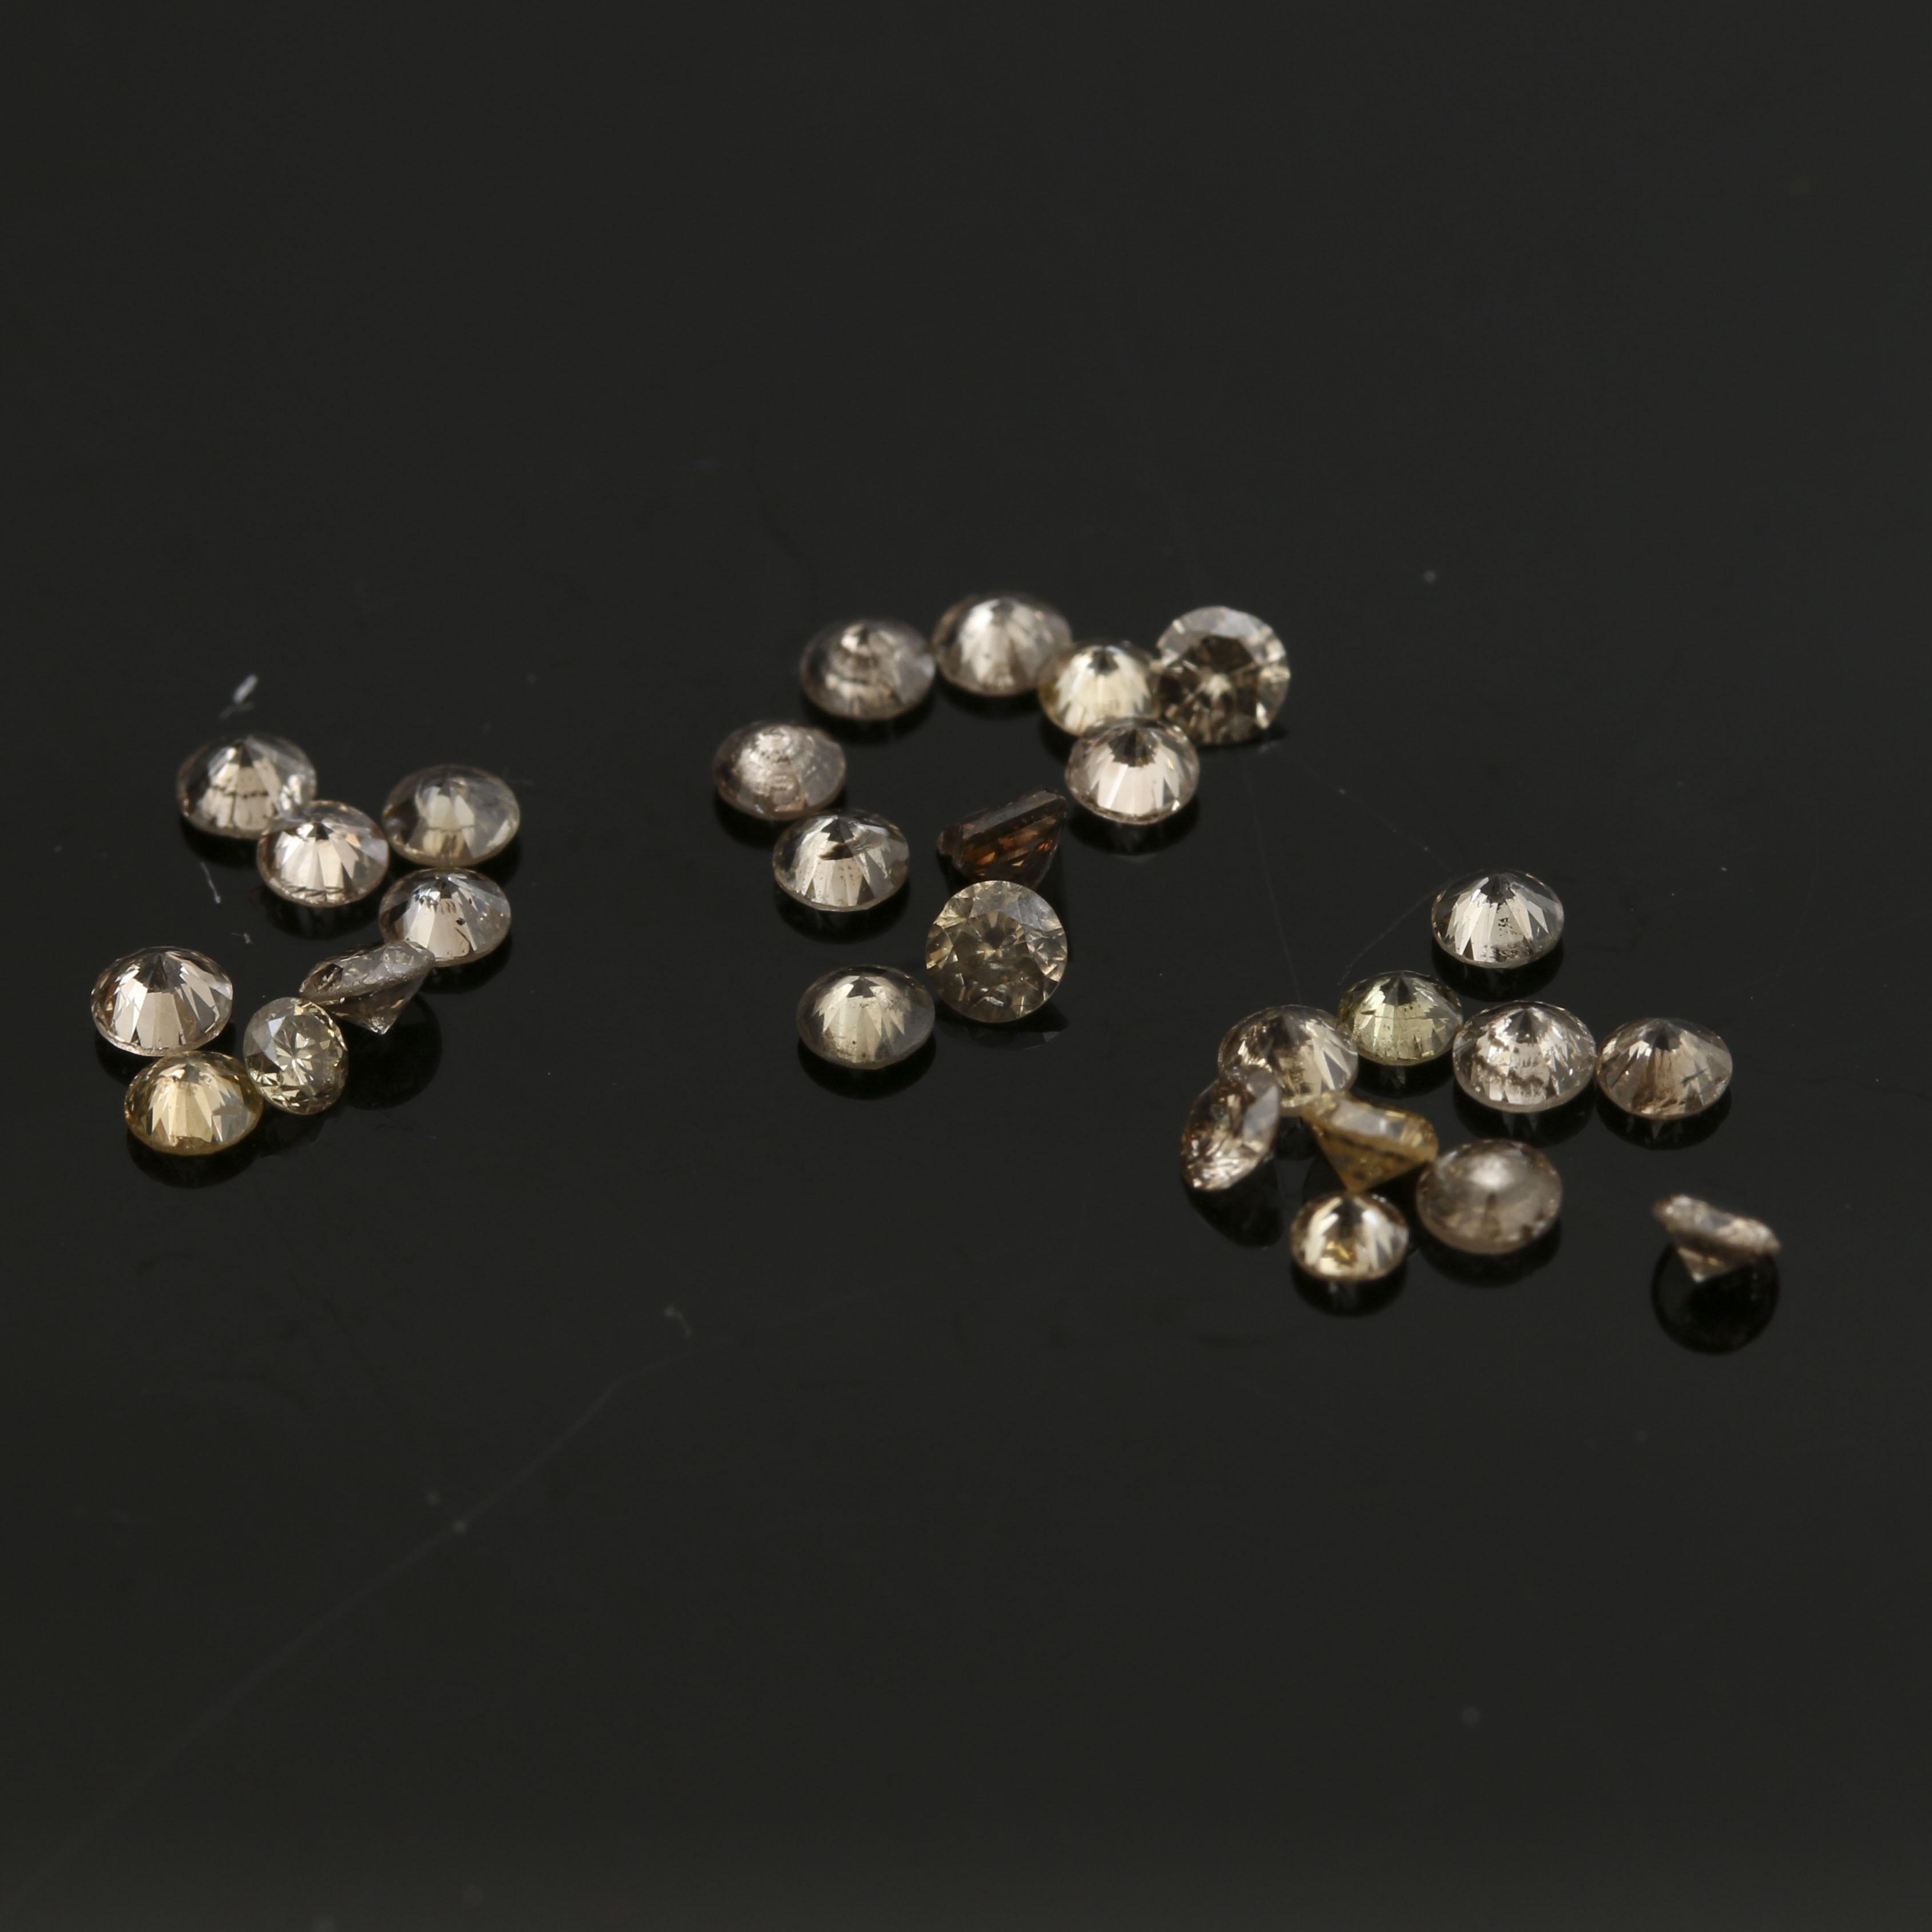 Loose 1.13 CTW Diamond Assortment